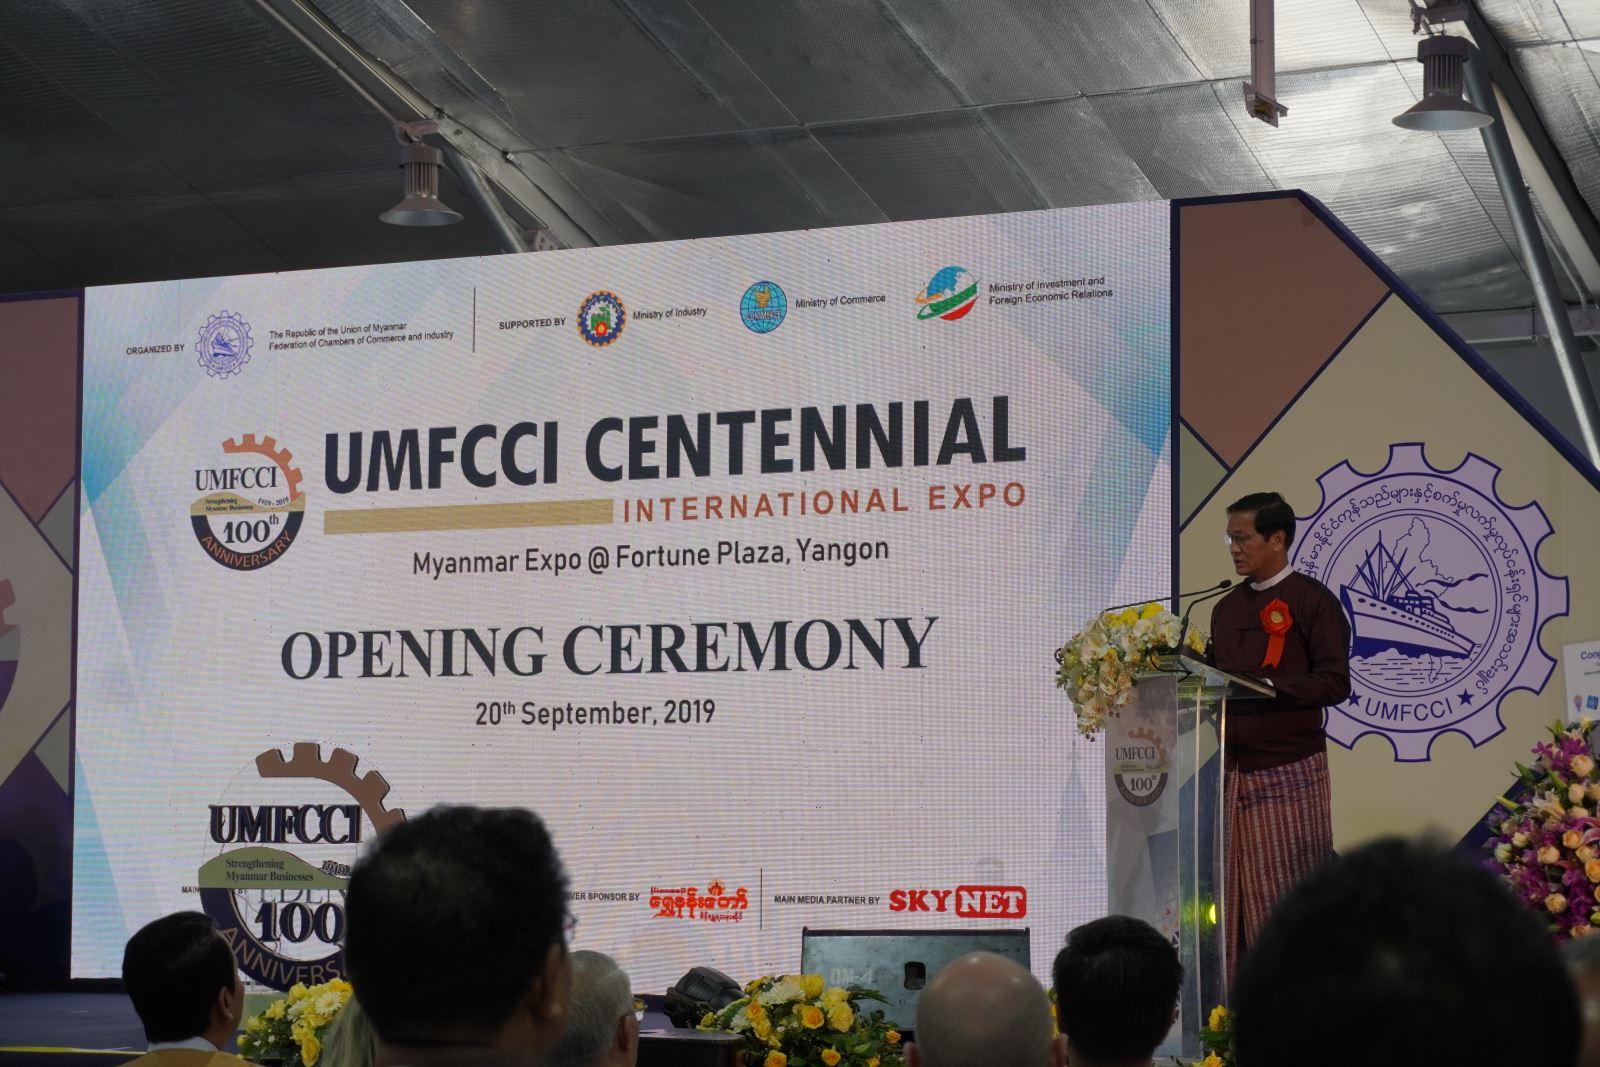 2019.09.20-09.22 UMFCCI Centennial International Expo